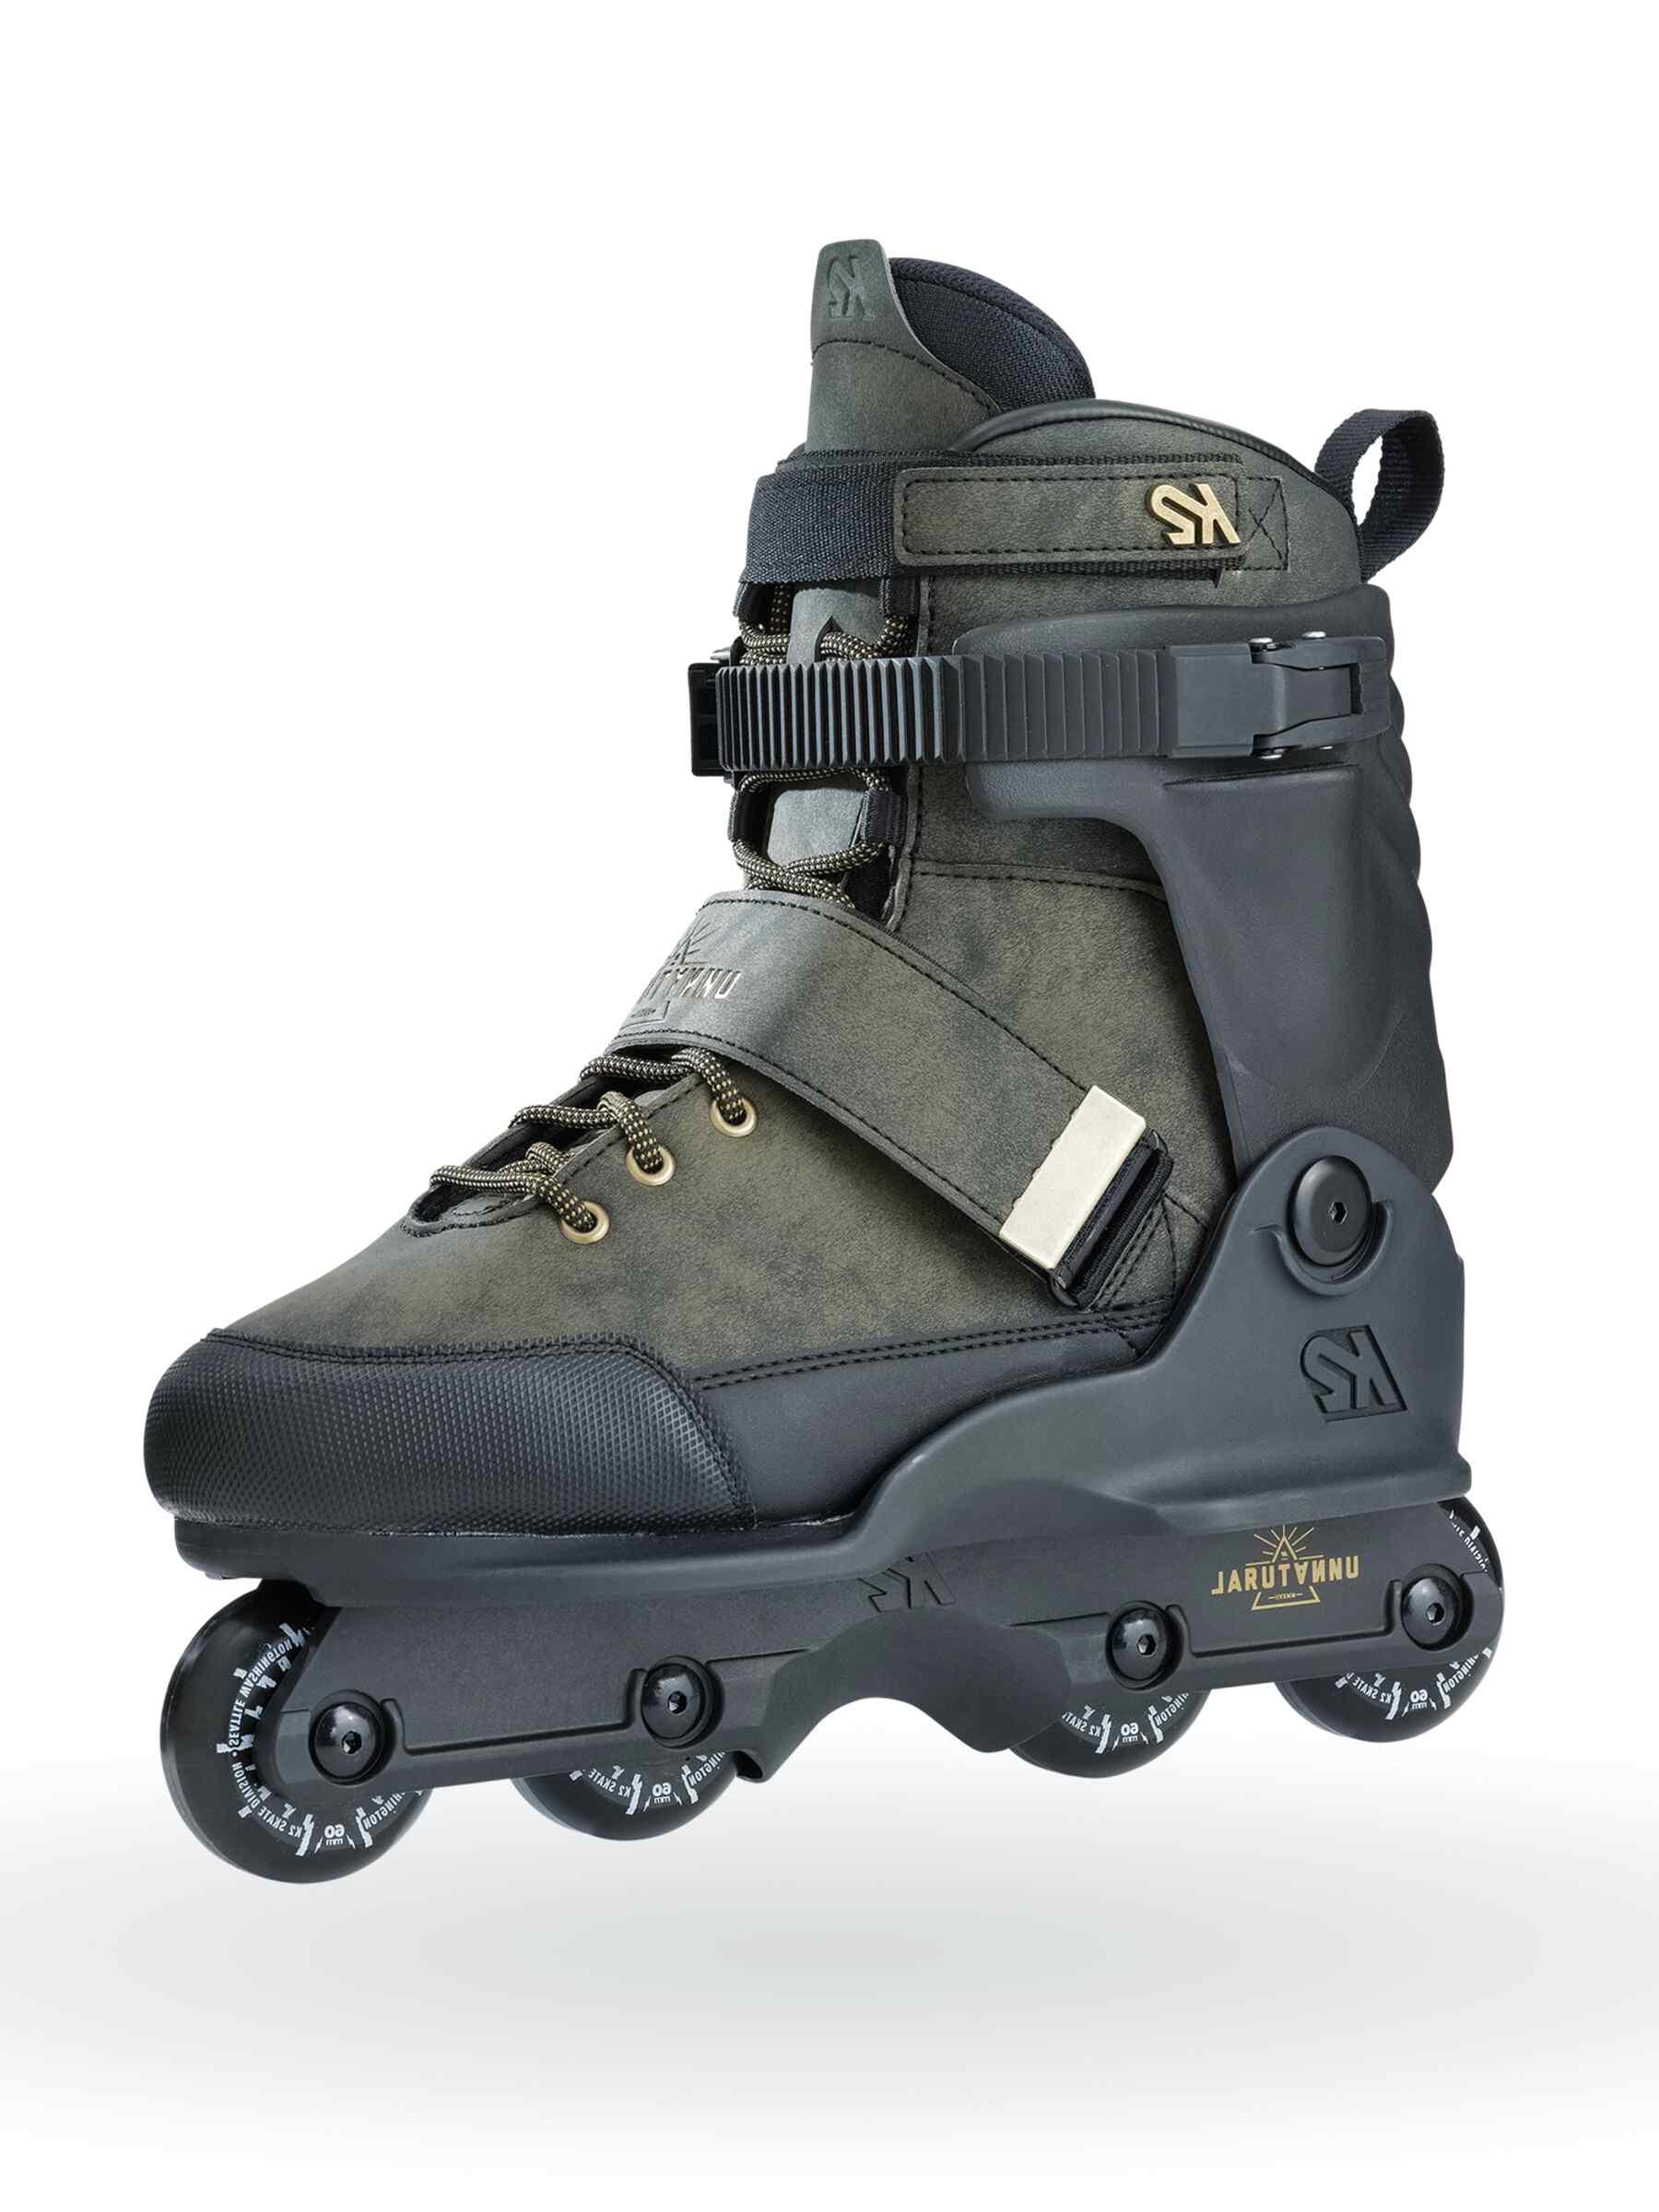 k2 skates for sale